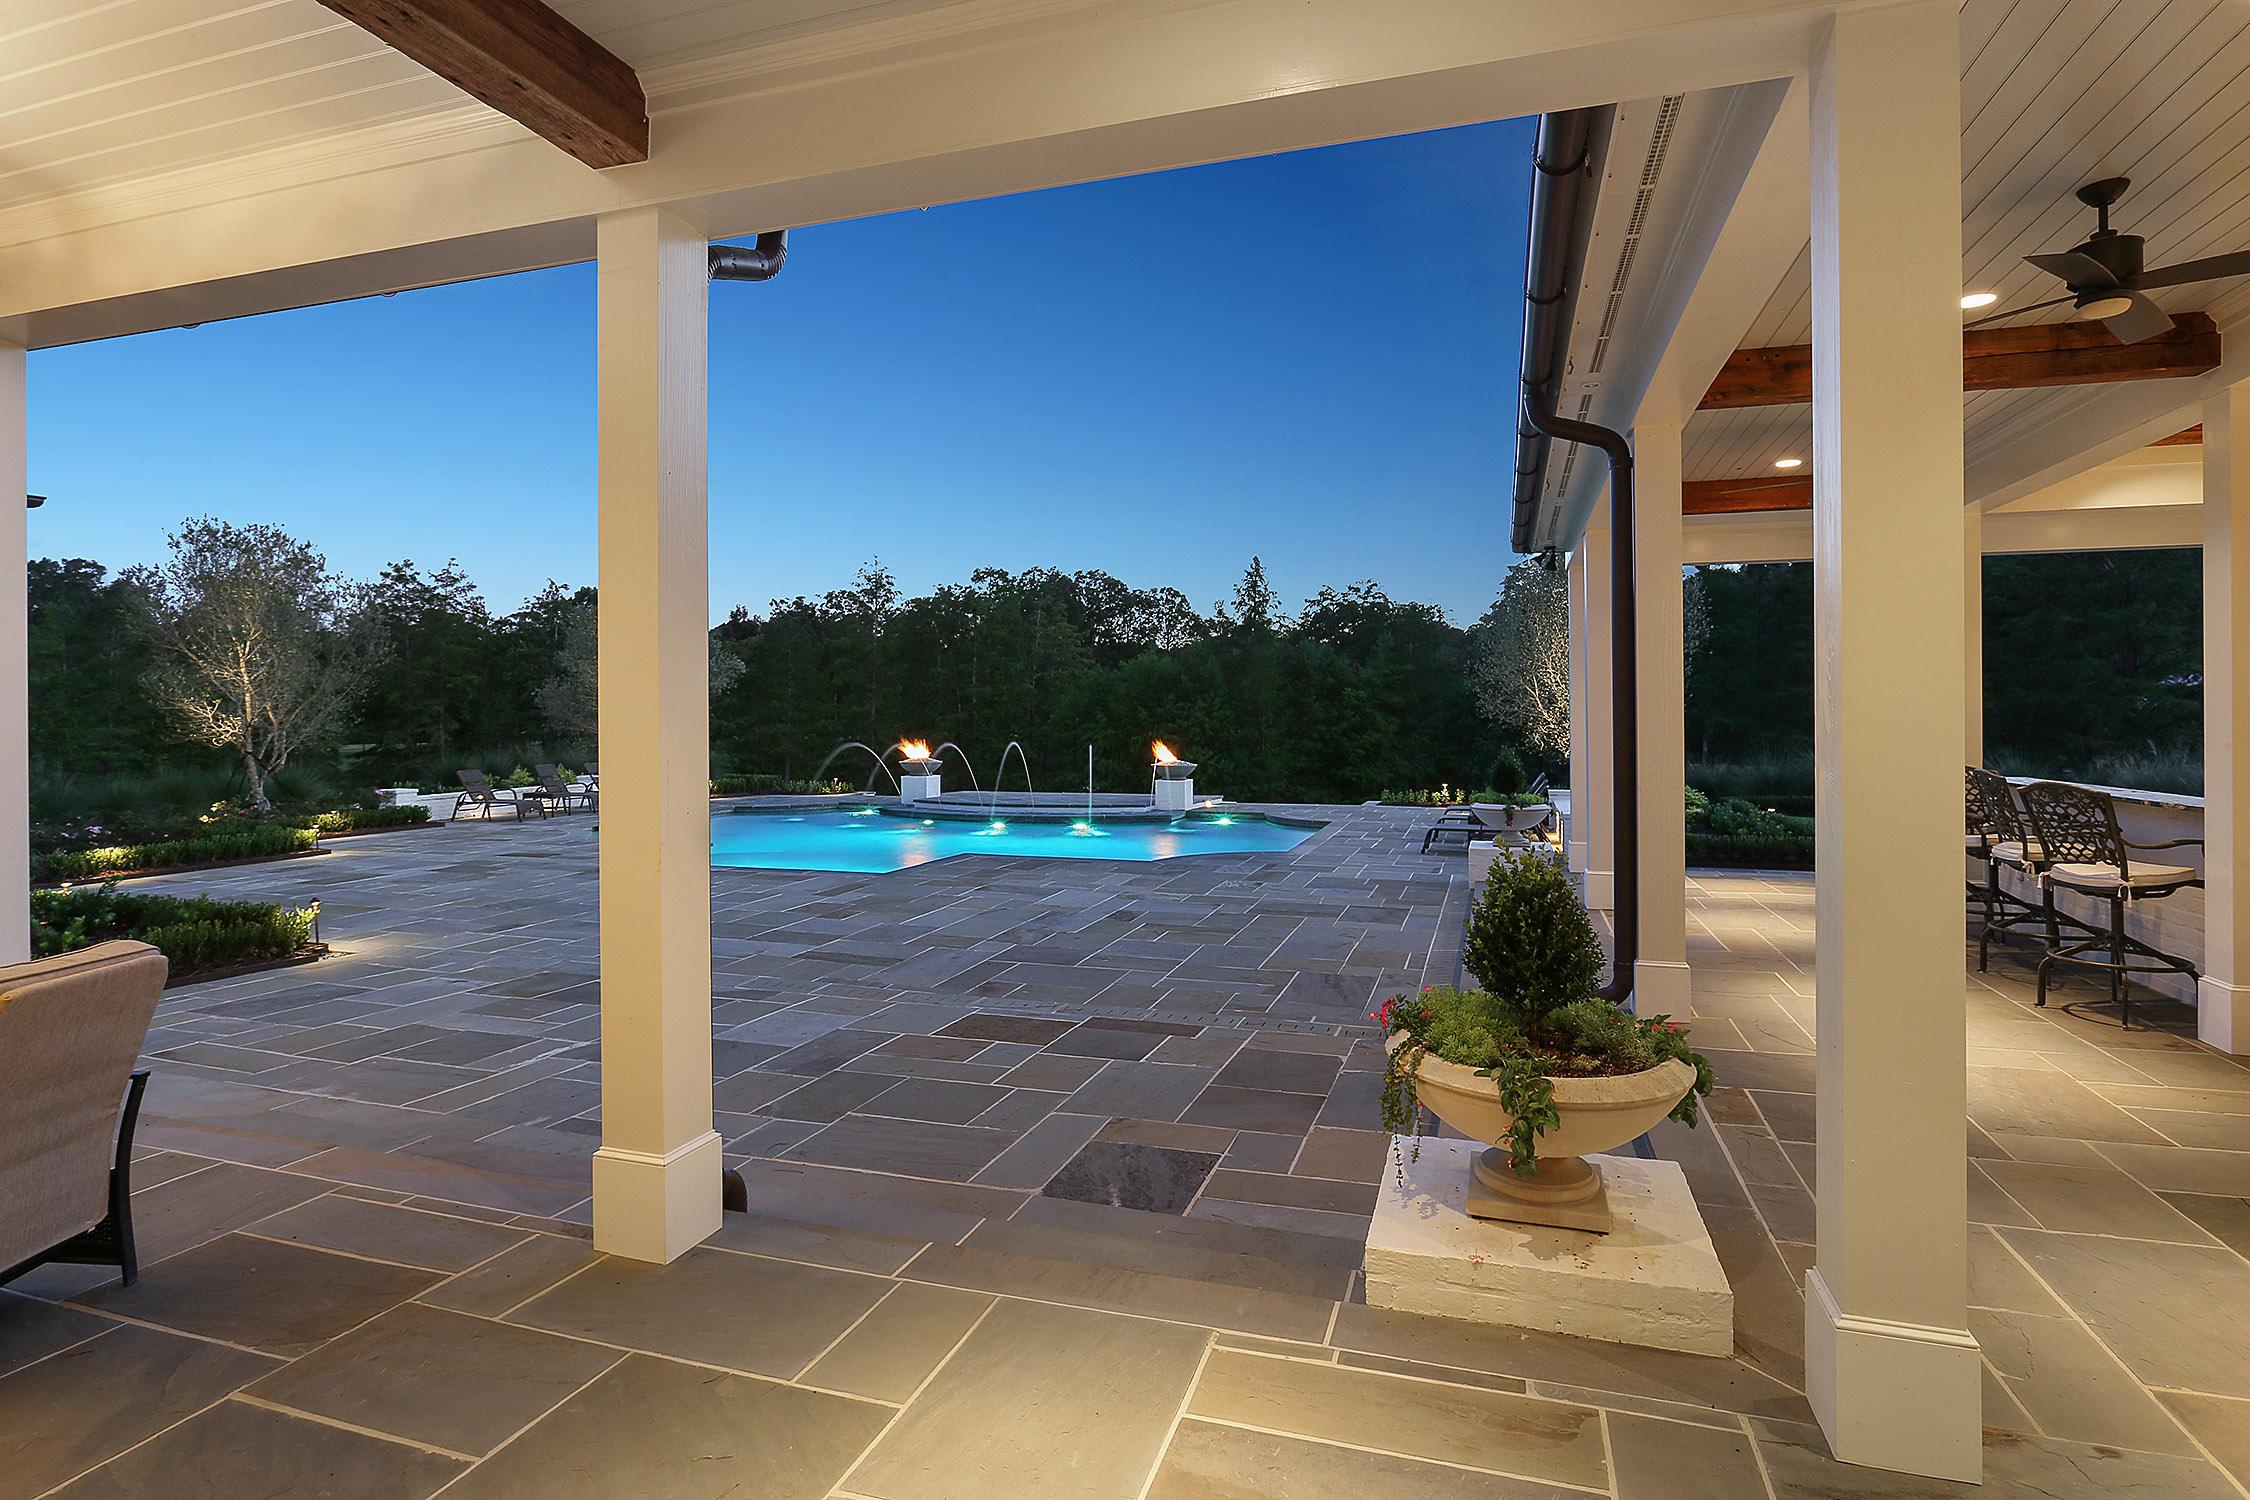 pennsylvania blue stone decking